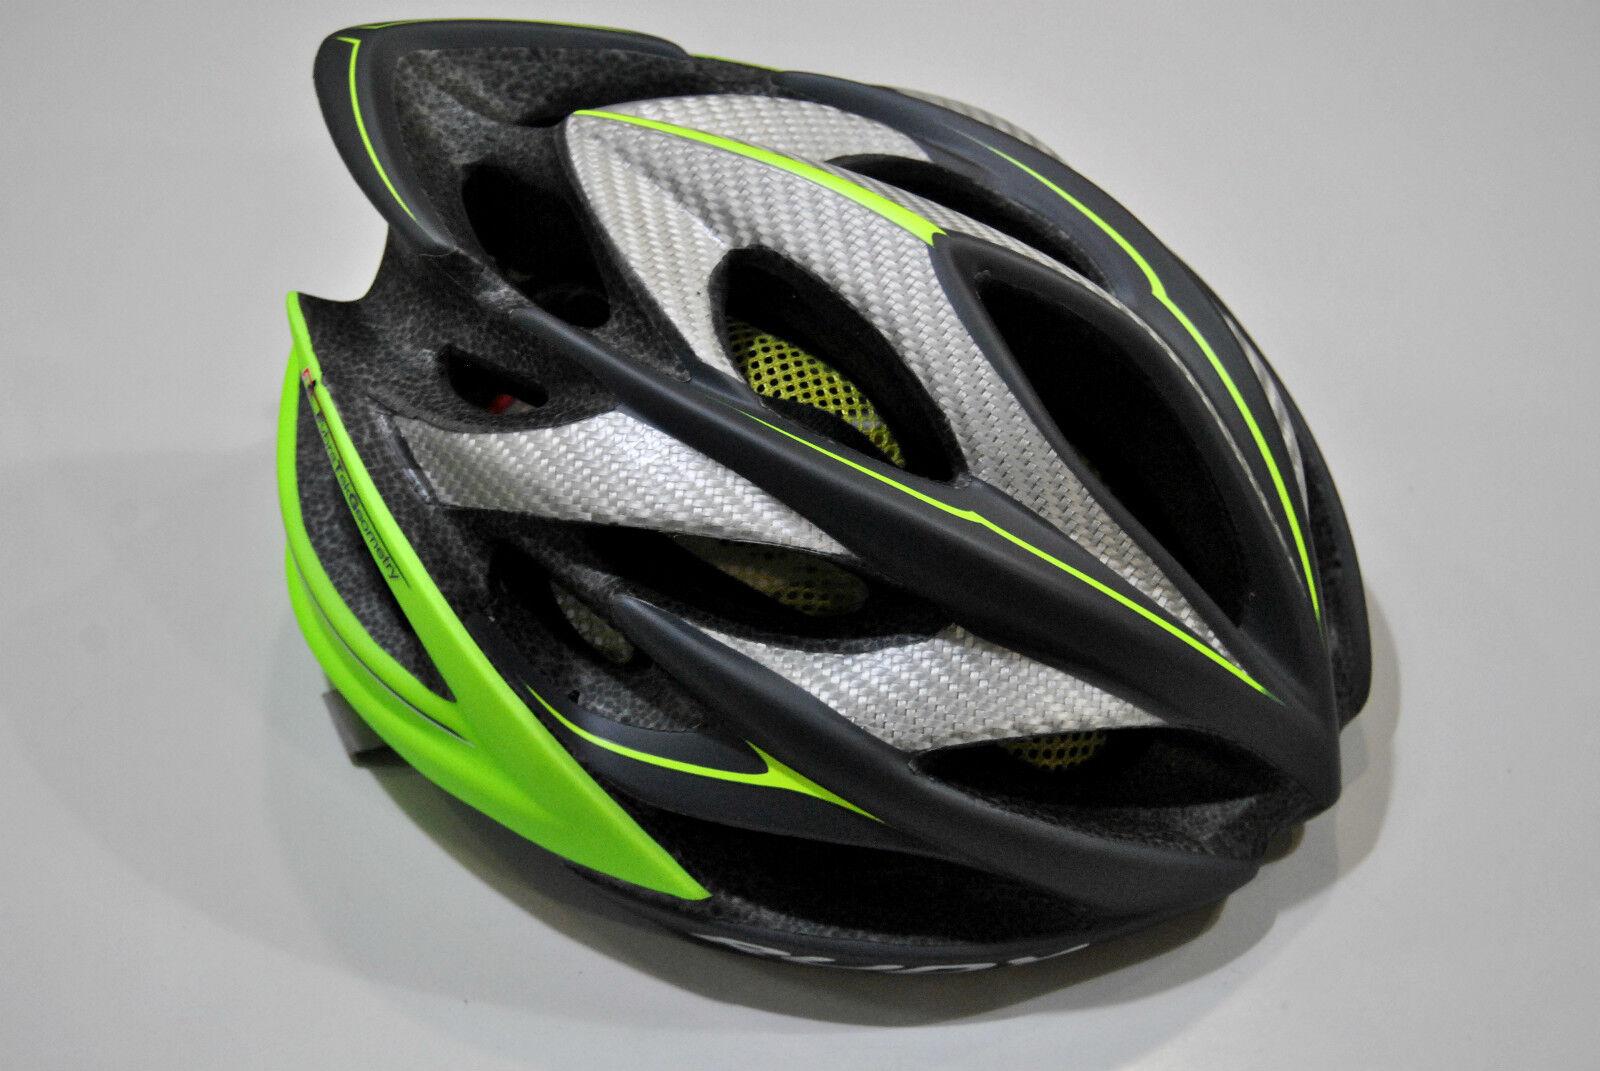 Casco da bici RUDY PROJECT Mod.WINDMAX Col.Graphite Lime Fluo Mat HELMET WINDMAX